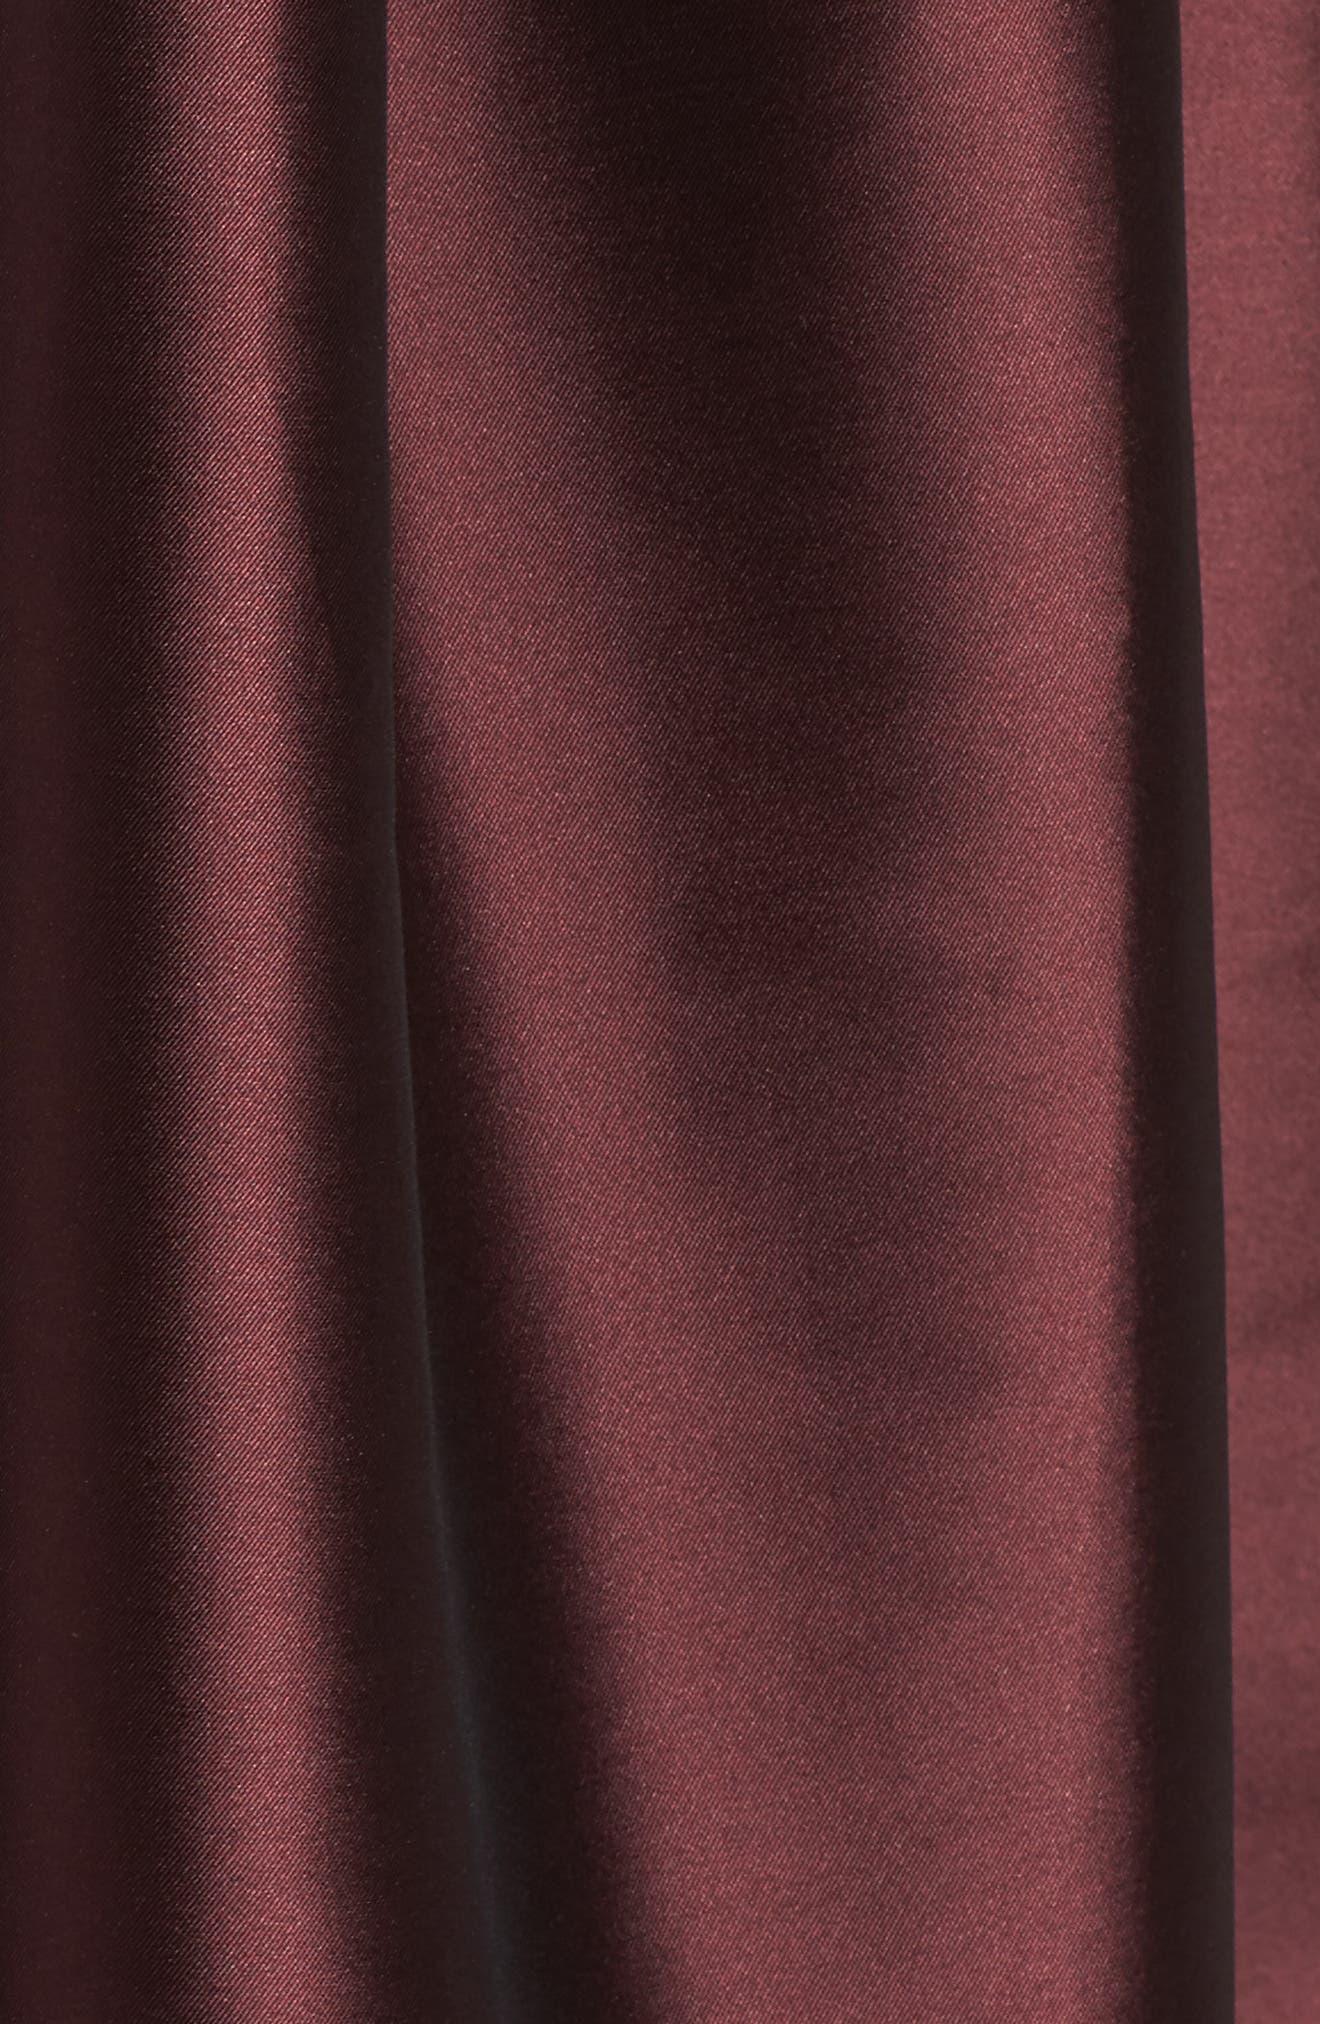 Noir Kerala Plunging Mikado Party Dress,                             Alternate thumbnail 5, color,                             931